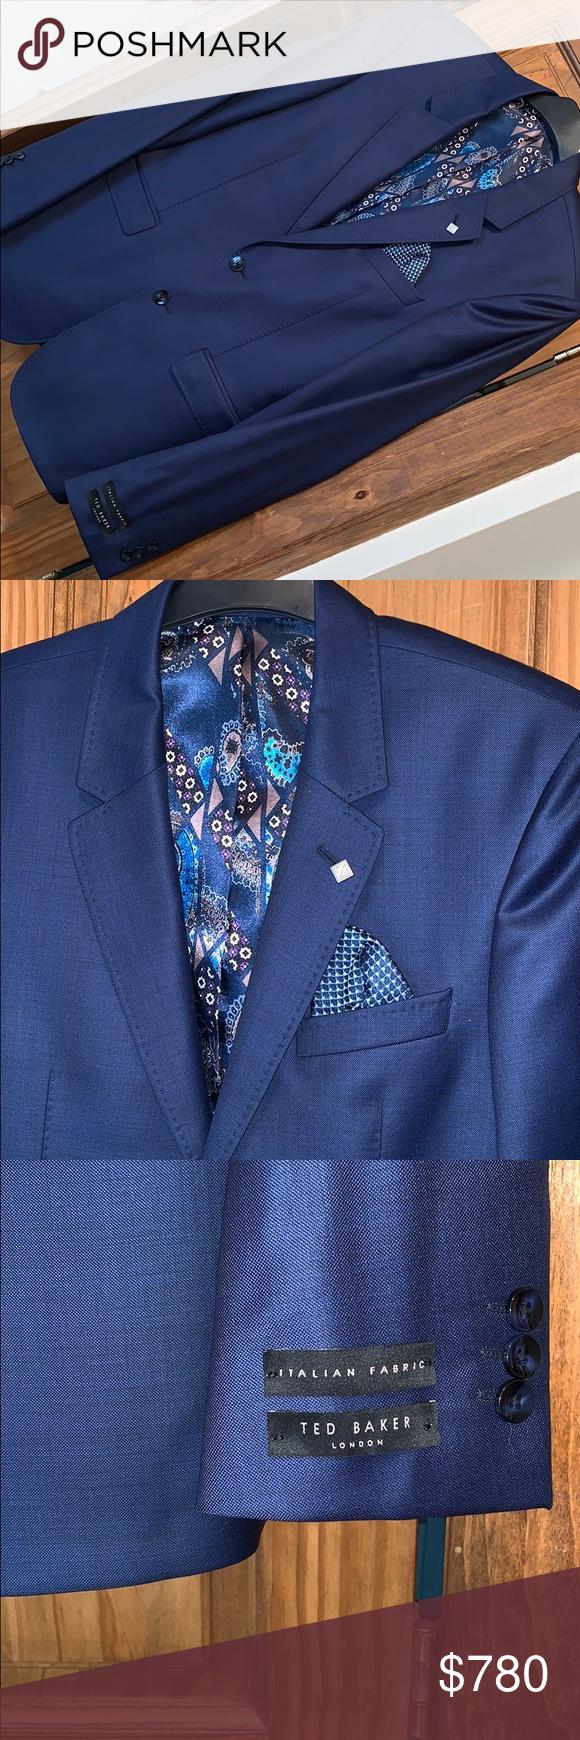 Ted Baker 3 Piece suit (BLUE) Men's Ted Baker 3 piece suit (NEWWW) Never been worn! Has been in Bloo...